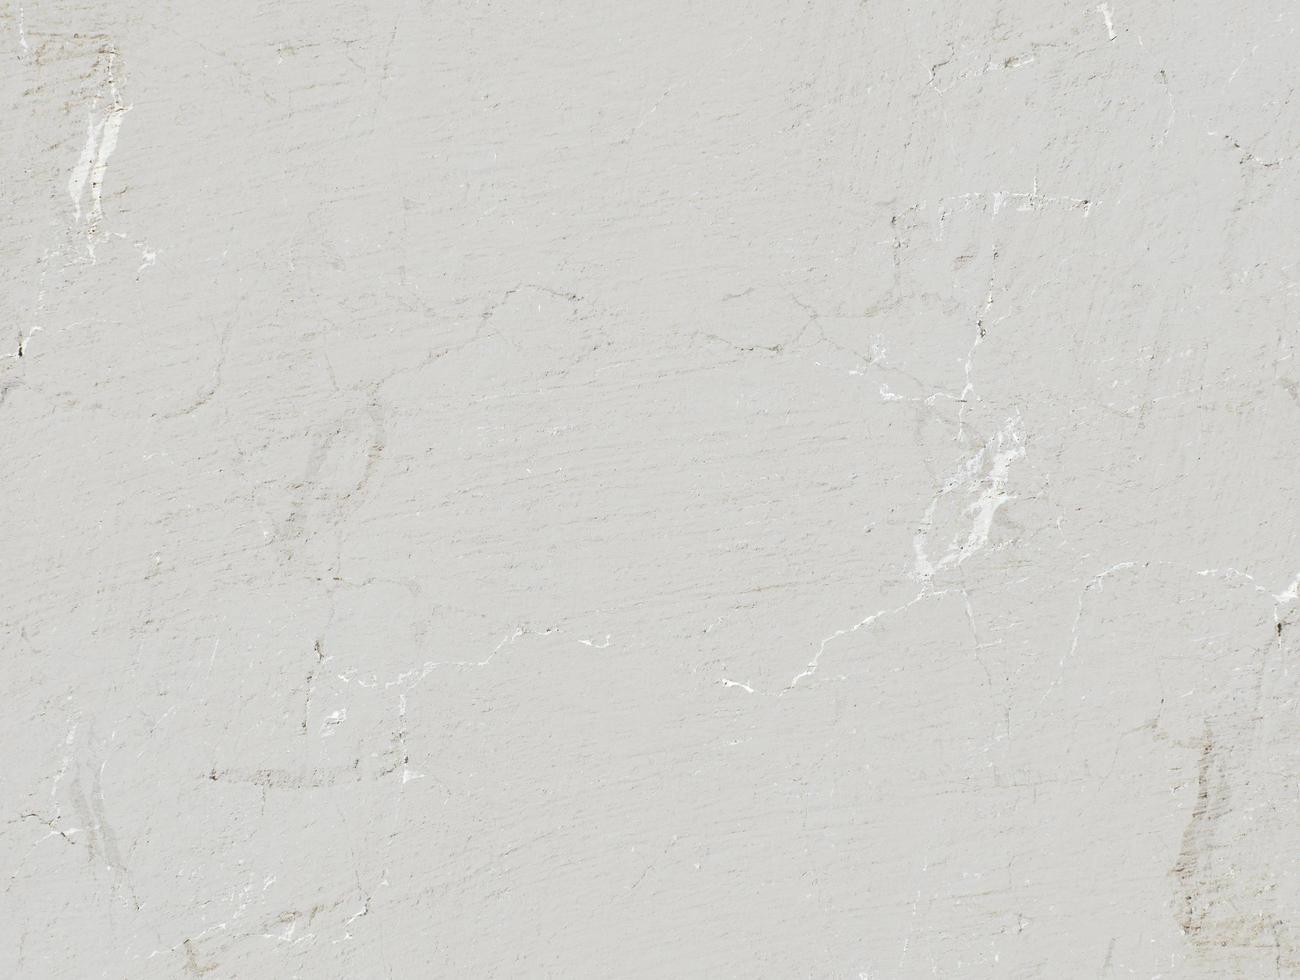 textura de parede grunge neutra foto